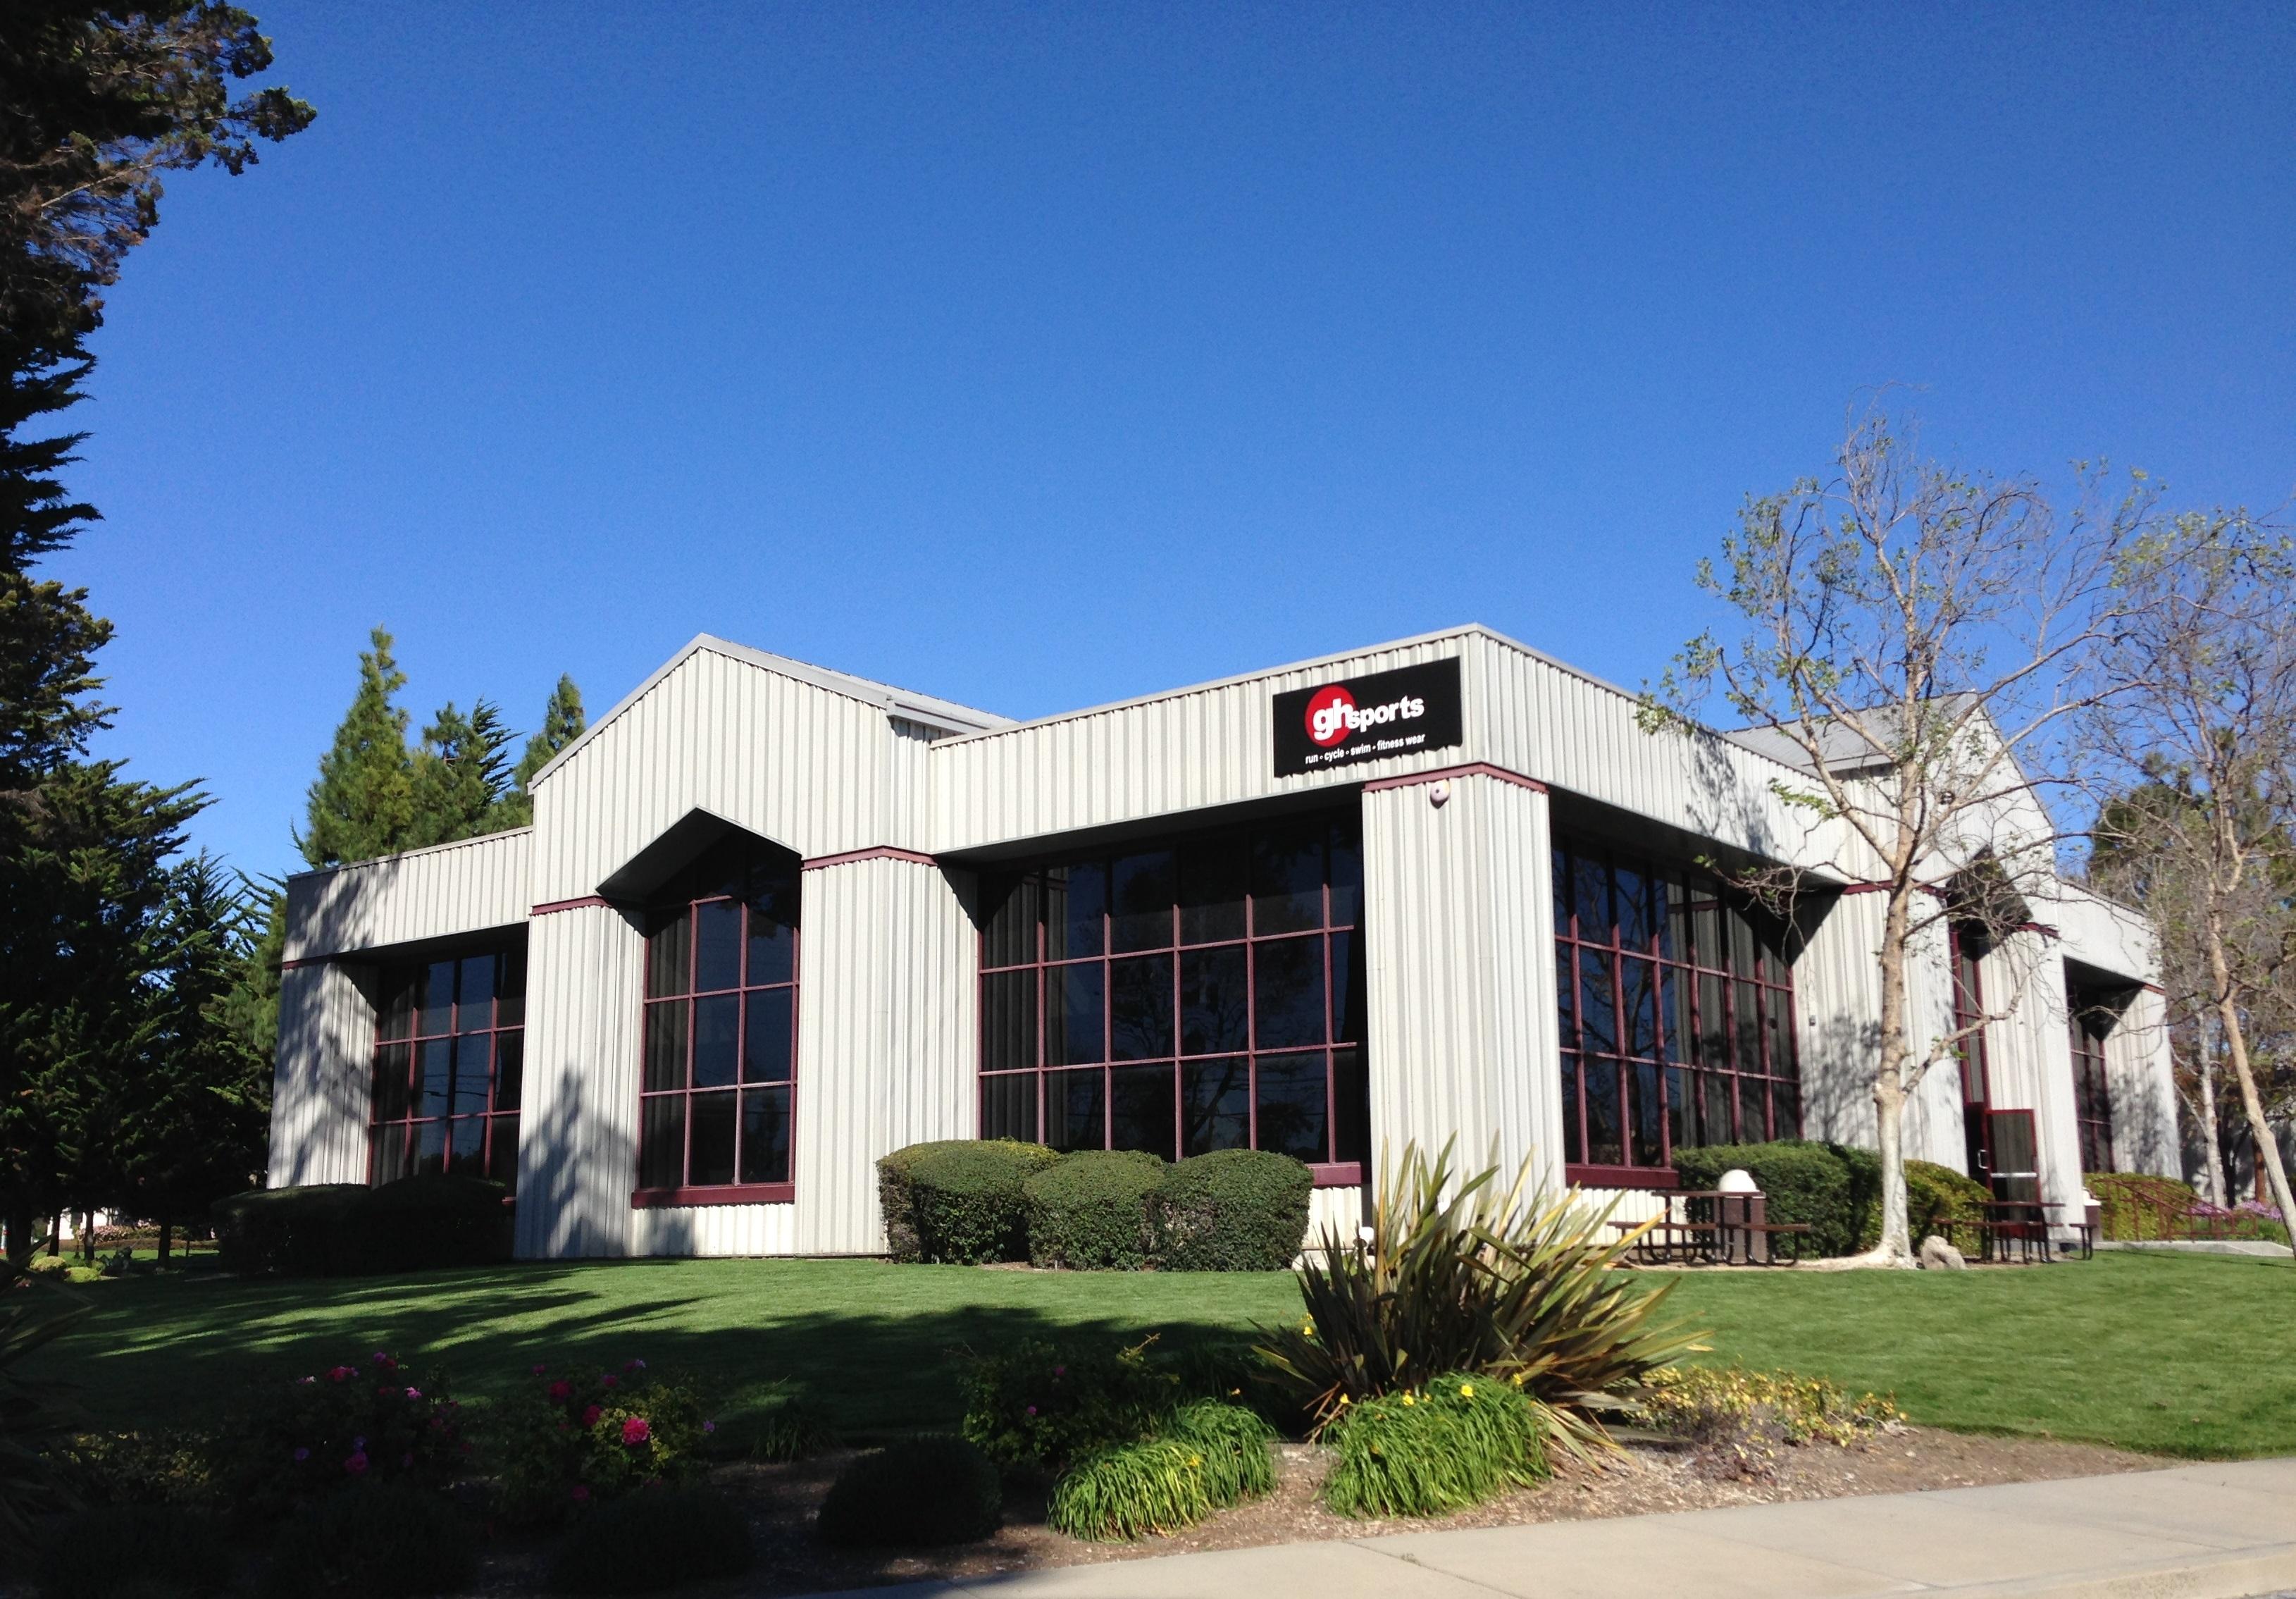 GH Sports now at 3765 S. Higuera, Suite 100, San Luis Obispo, California